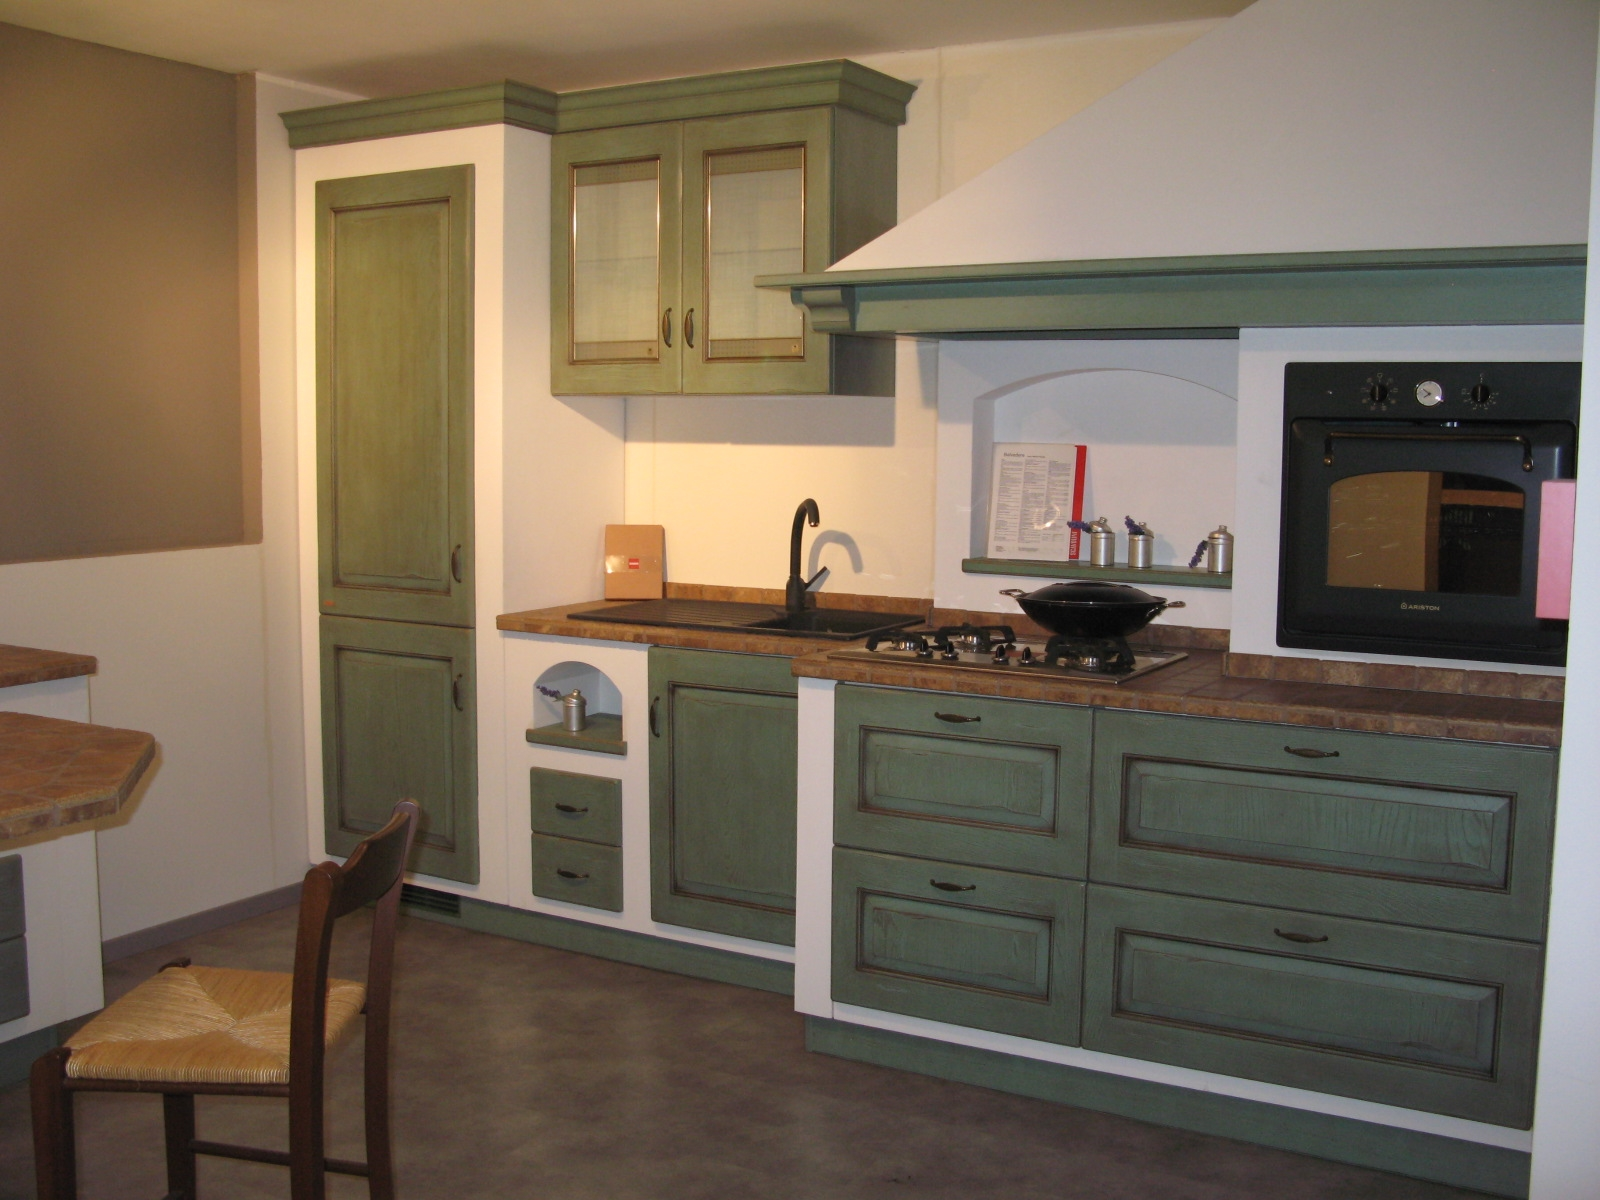 Scavolini offertissima outlet mod belvedere cucine a prezzi scontati - Costi cucine scavolini ...